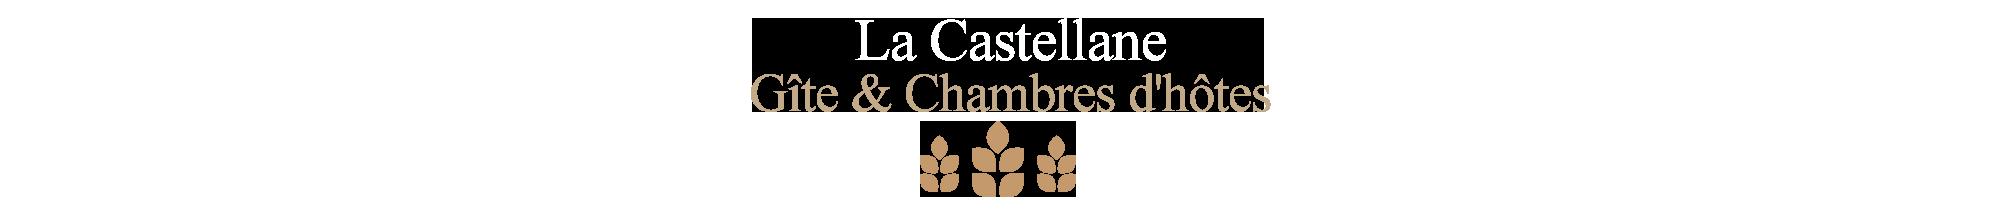 titre-la-castellane